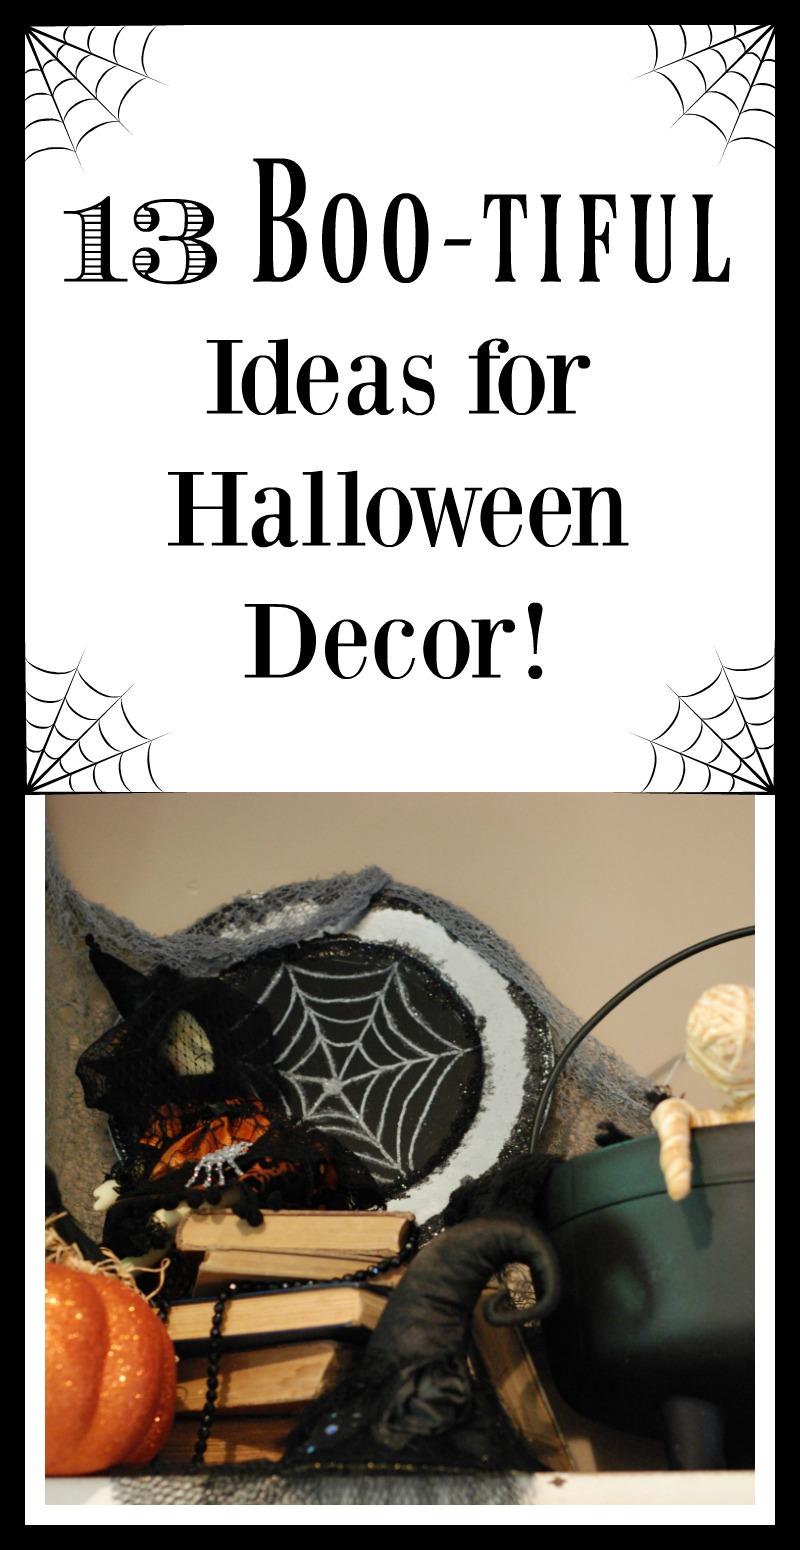 13 Boo-tiful Ideas for Halloween Decor! www.thatonemom.com